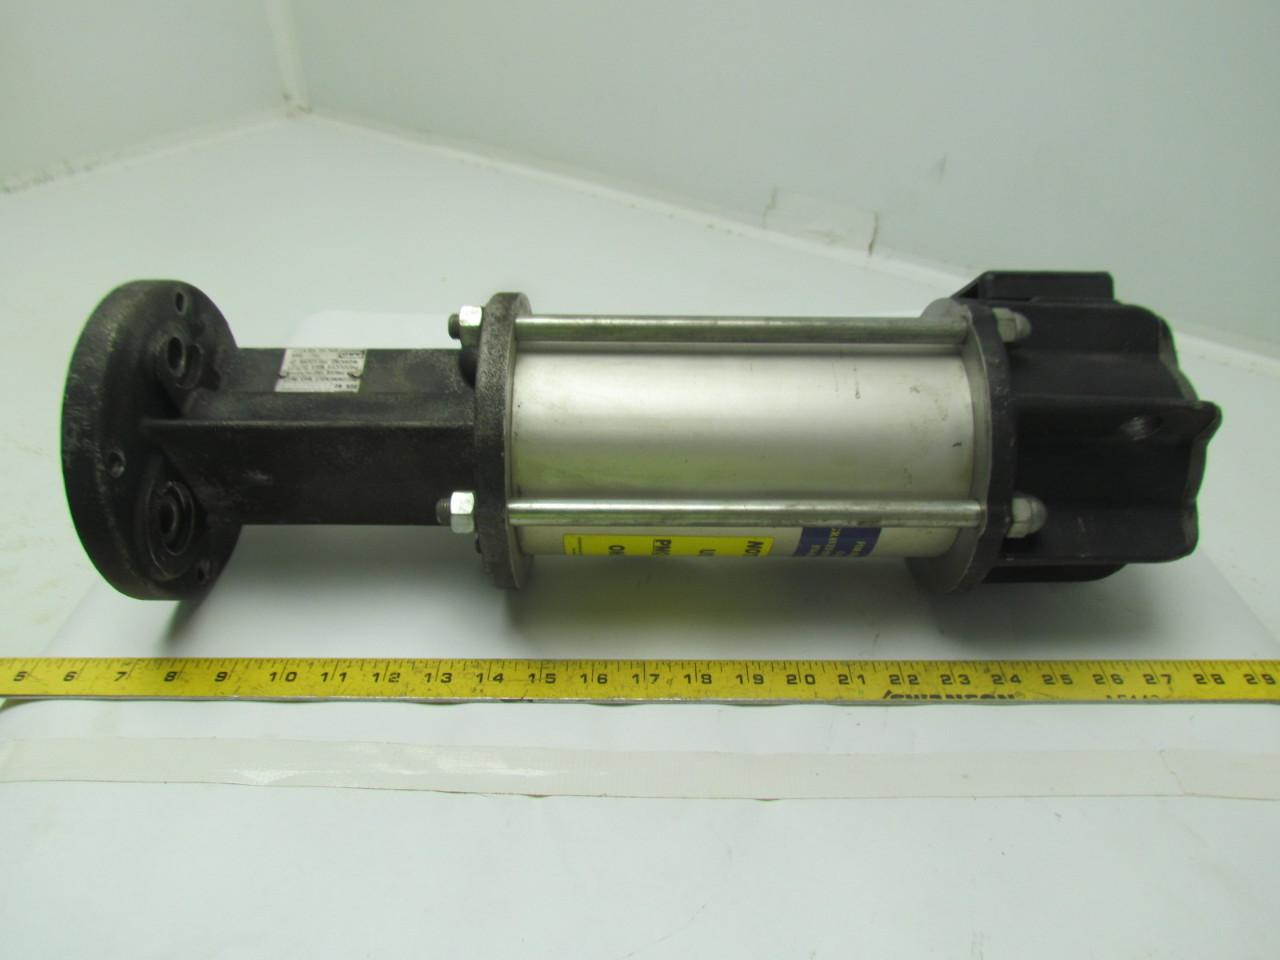 Aro 650477 G13 4 1 4 Air Motor Paint Sprayer Pump 1 2